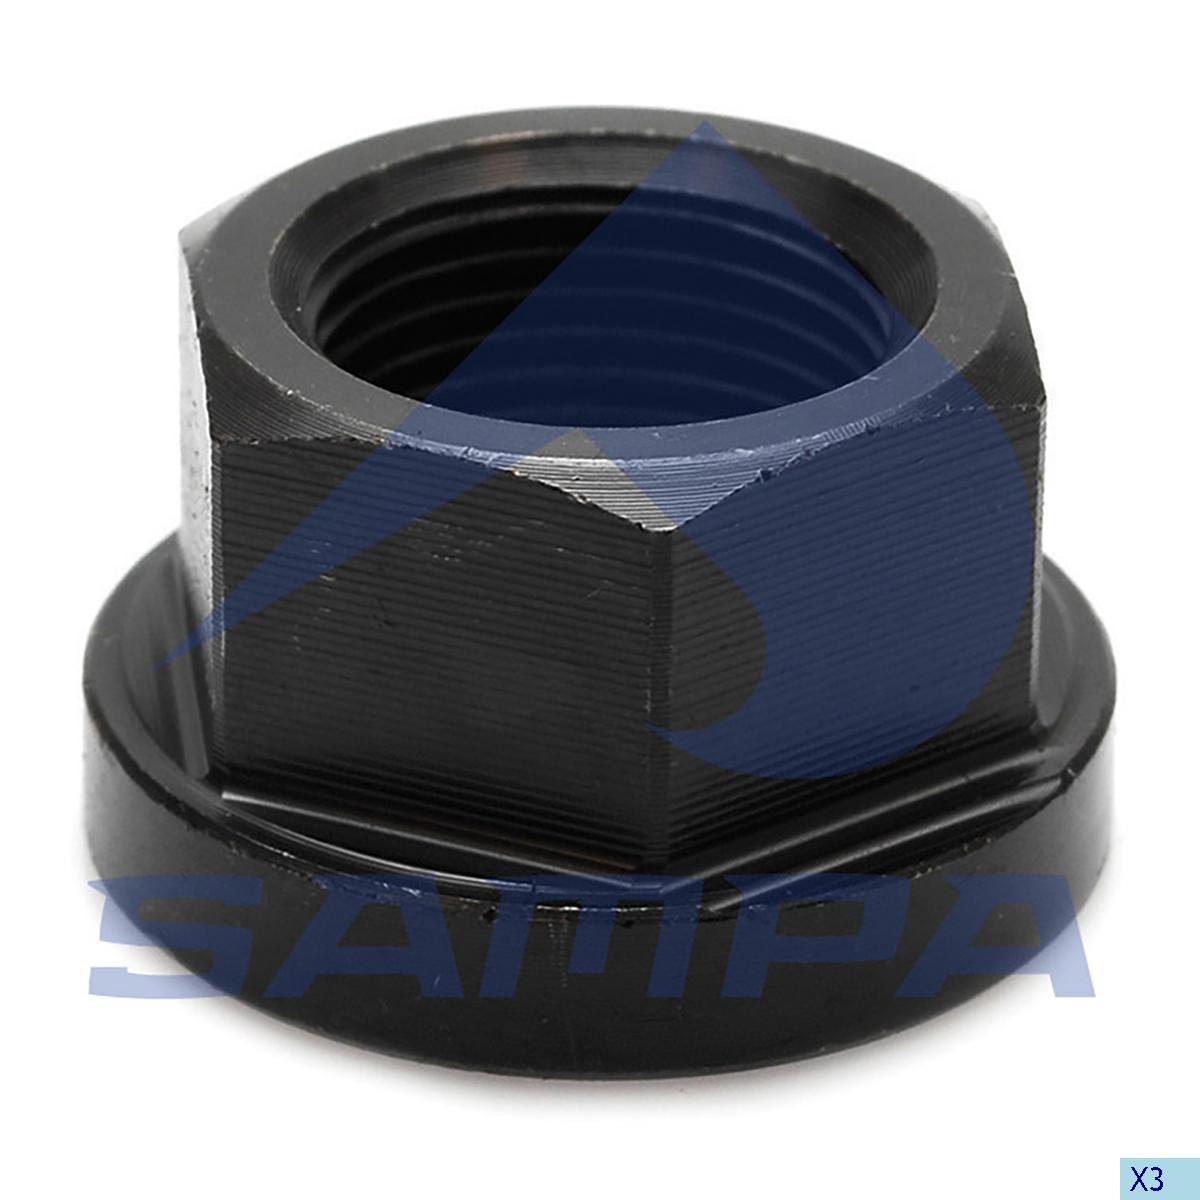 Nut, Cylinder Block, Volvo, Compressed Air System